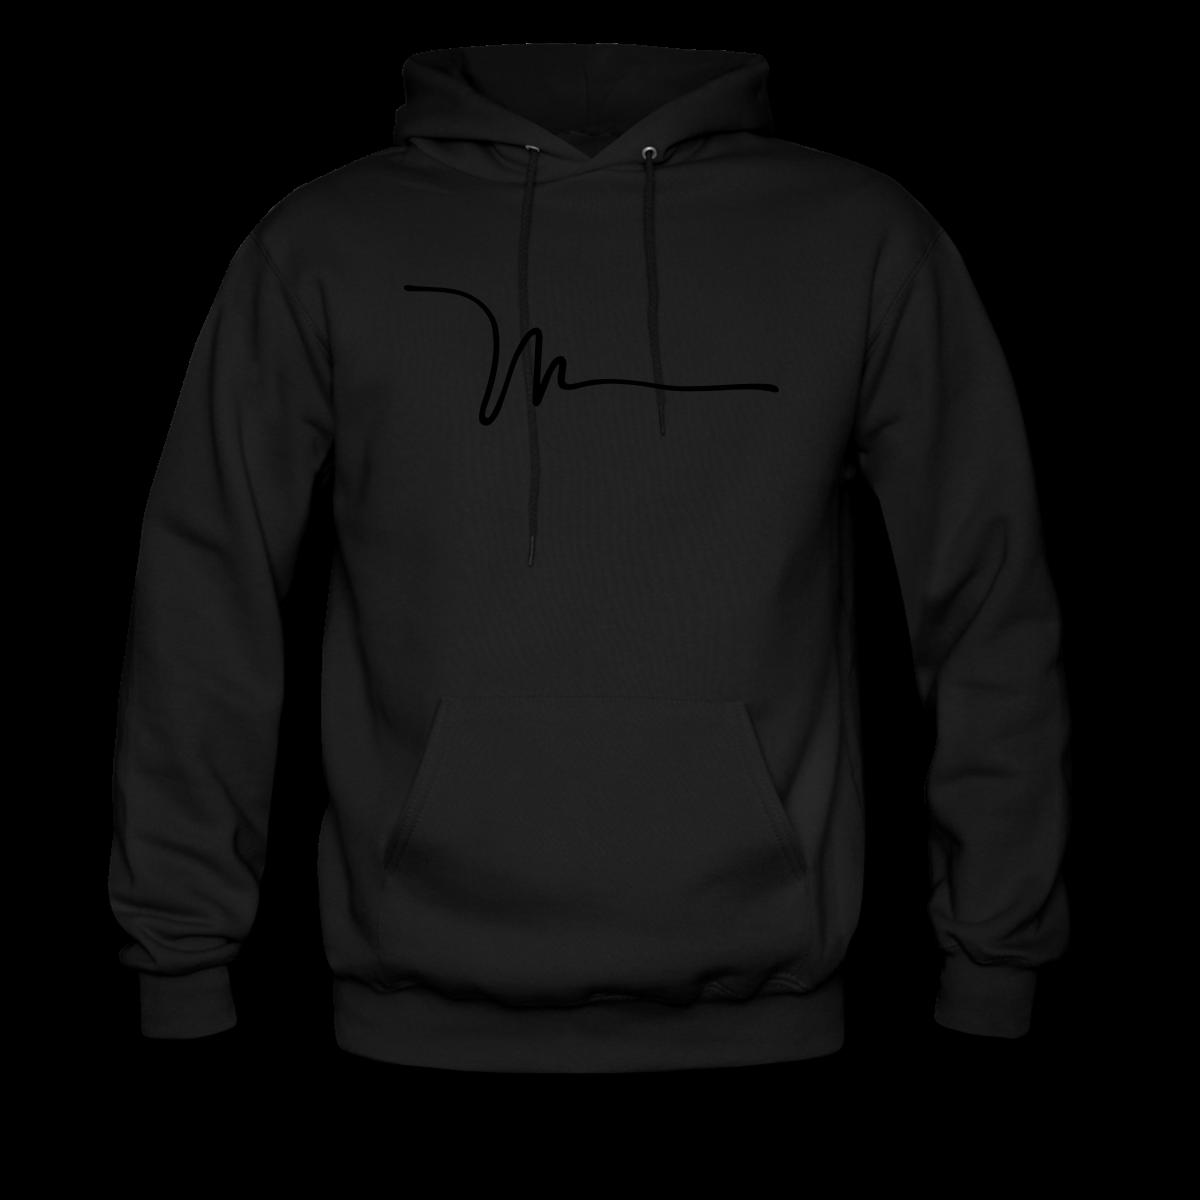 M (pullover)